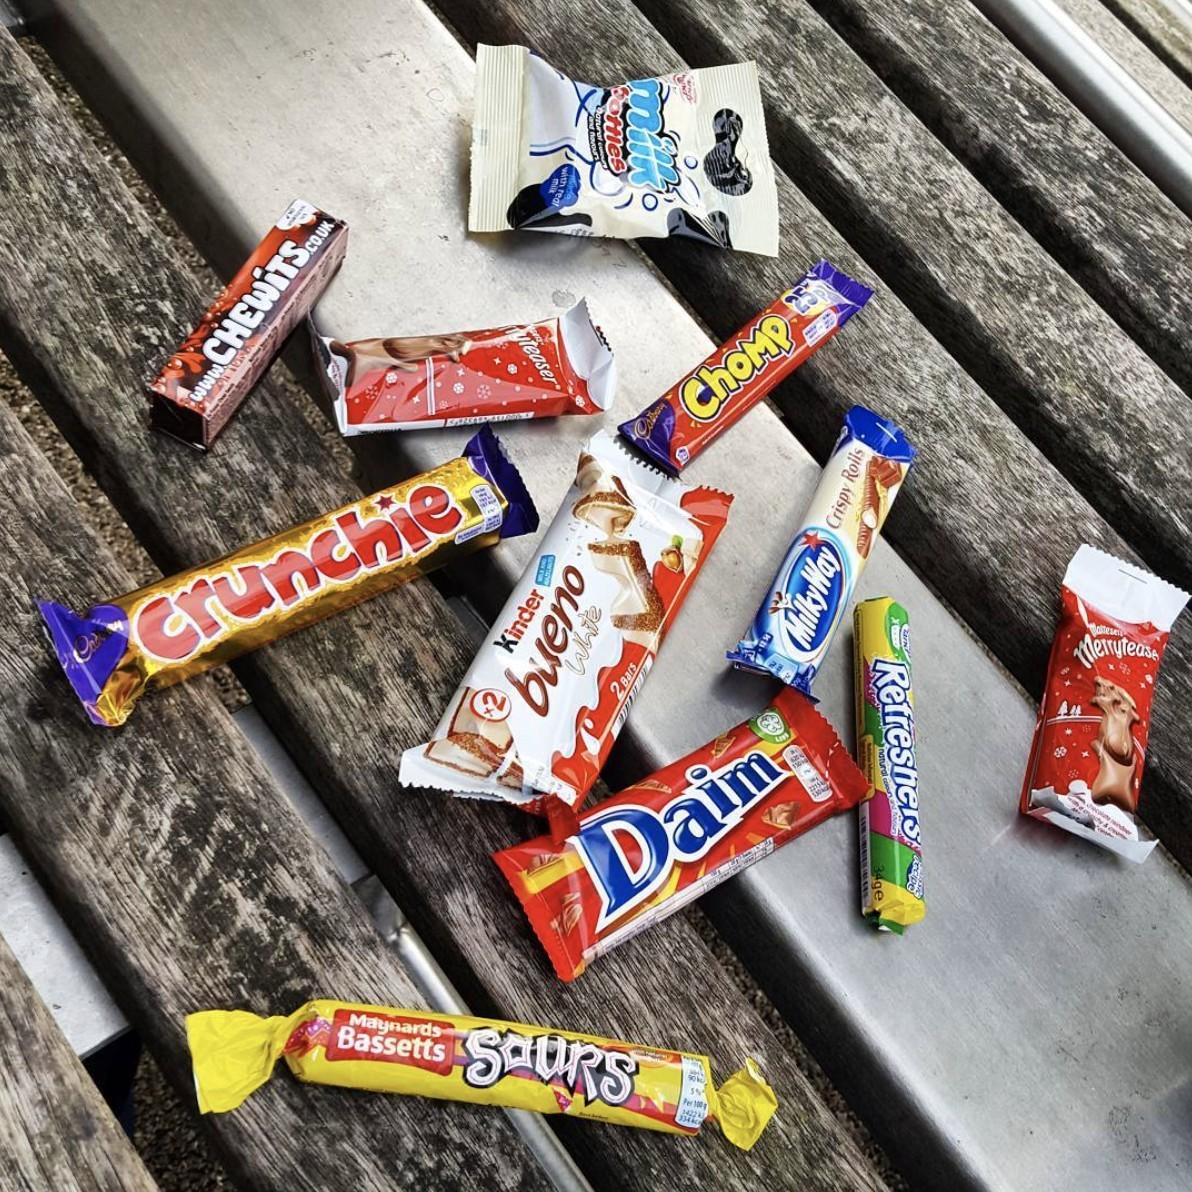 Sweeties, Sweets, Sweet treats, Chocolate, Maynards Bassetts, Kinder, Nestle, Cadbury, Treats, Foodie, Foodgasm,, London, Blog A Book Etc, Fay, Fit or Fat